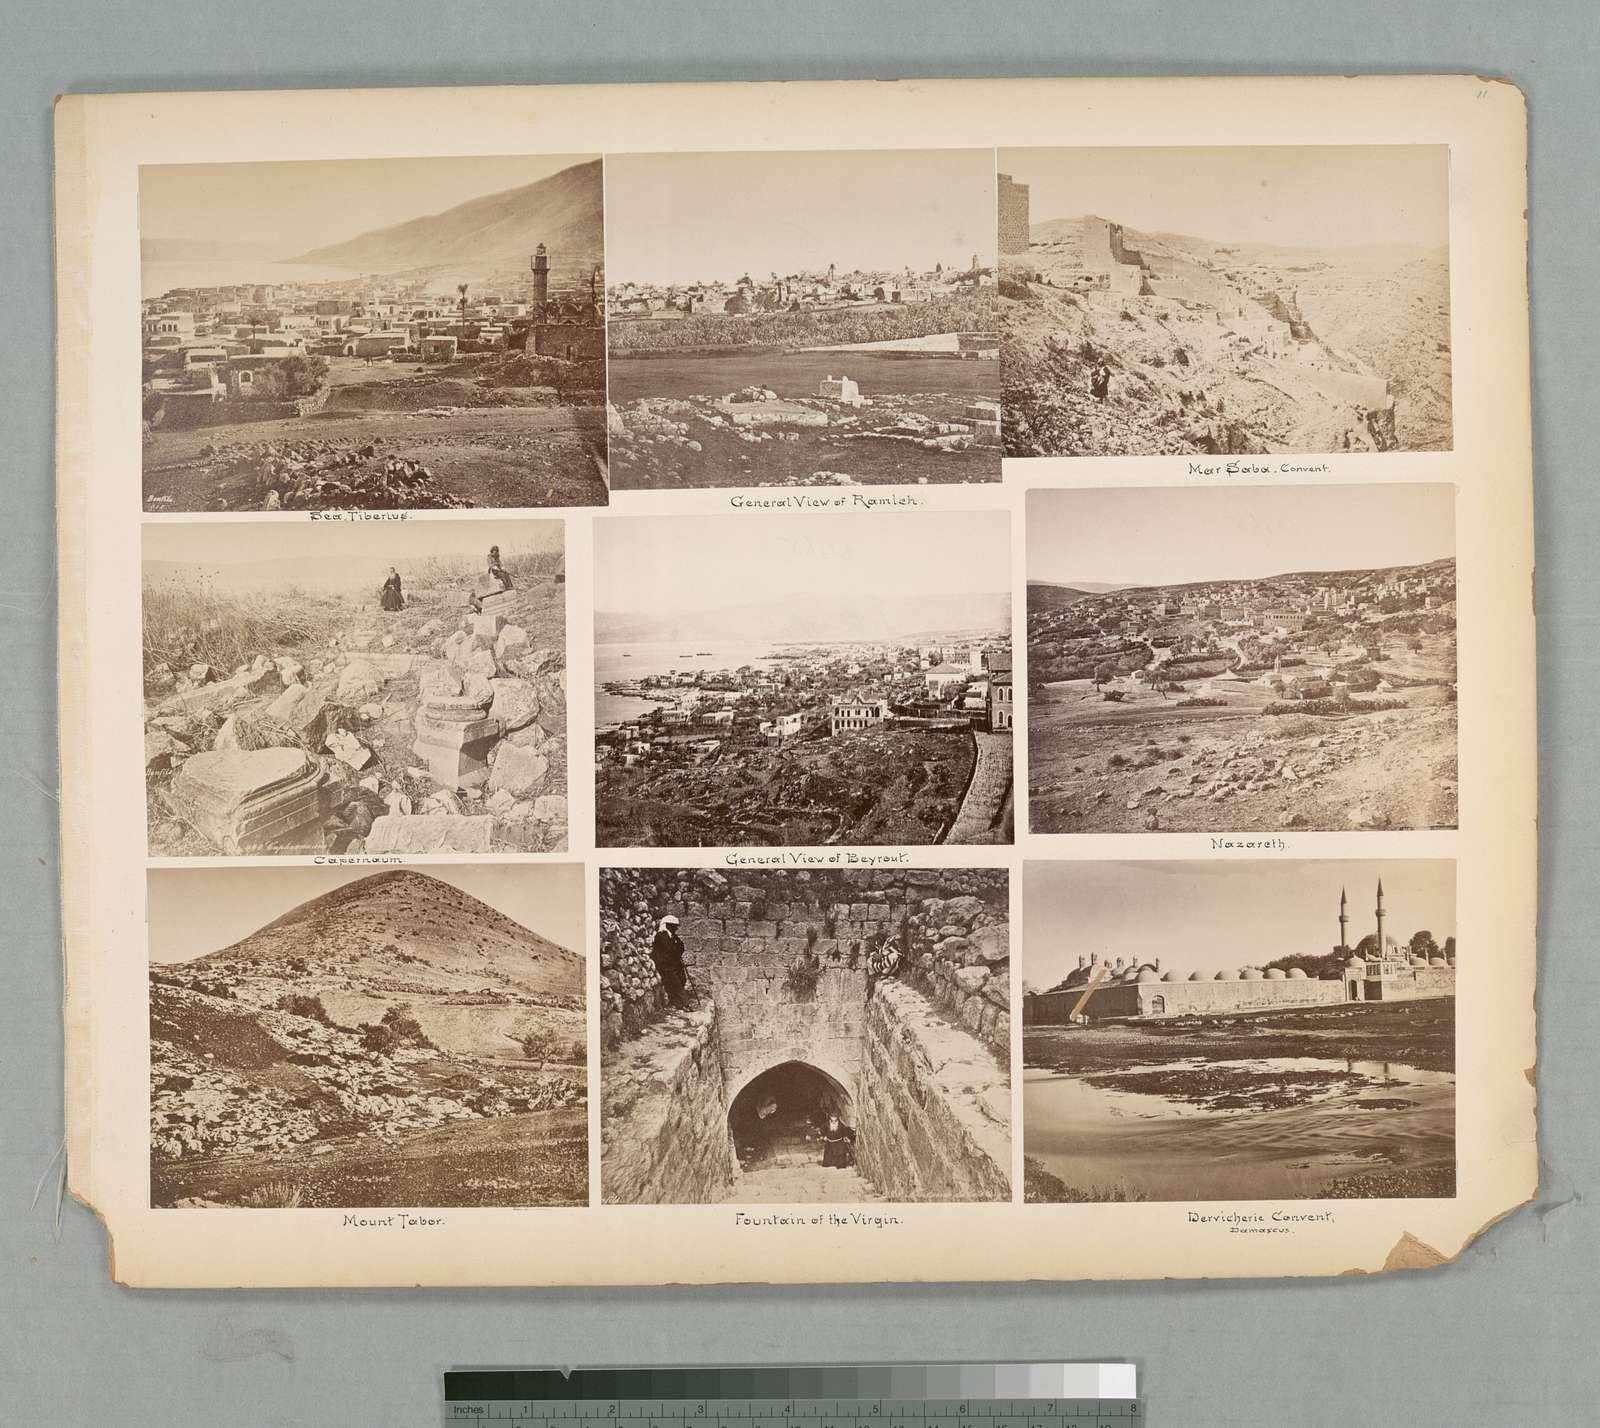 Sea Tiberius; General view of Ramleh; Mar Saba Convent; 440 Capharnaum; General view of Beyrout; 212 Nazareth (Palestine); Mount Tabor;  426 Fontaine de la vierge; Dervicherie convent, Damascus